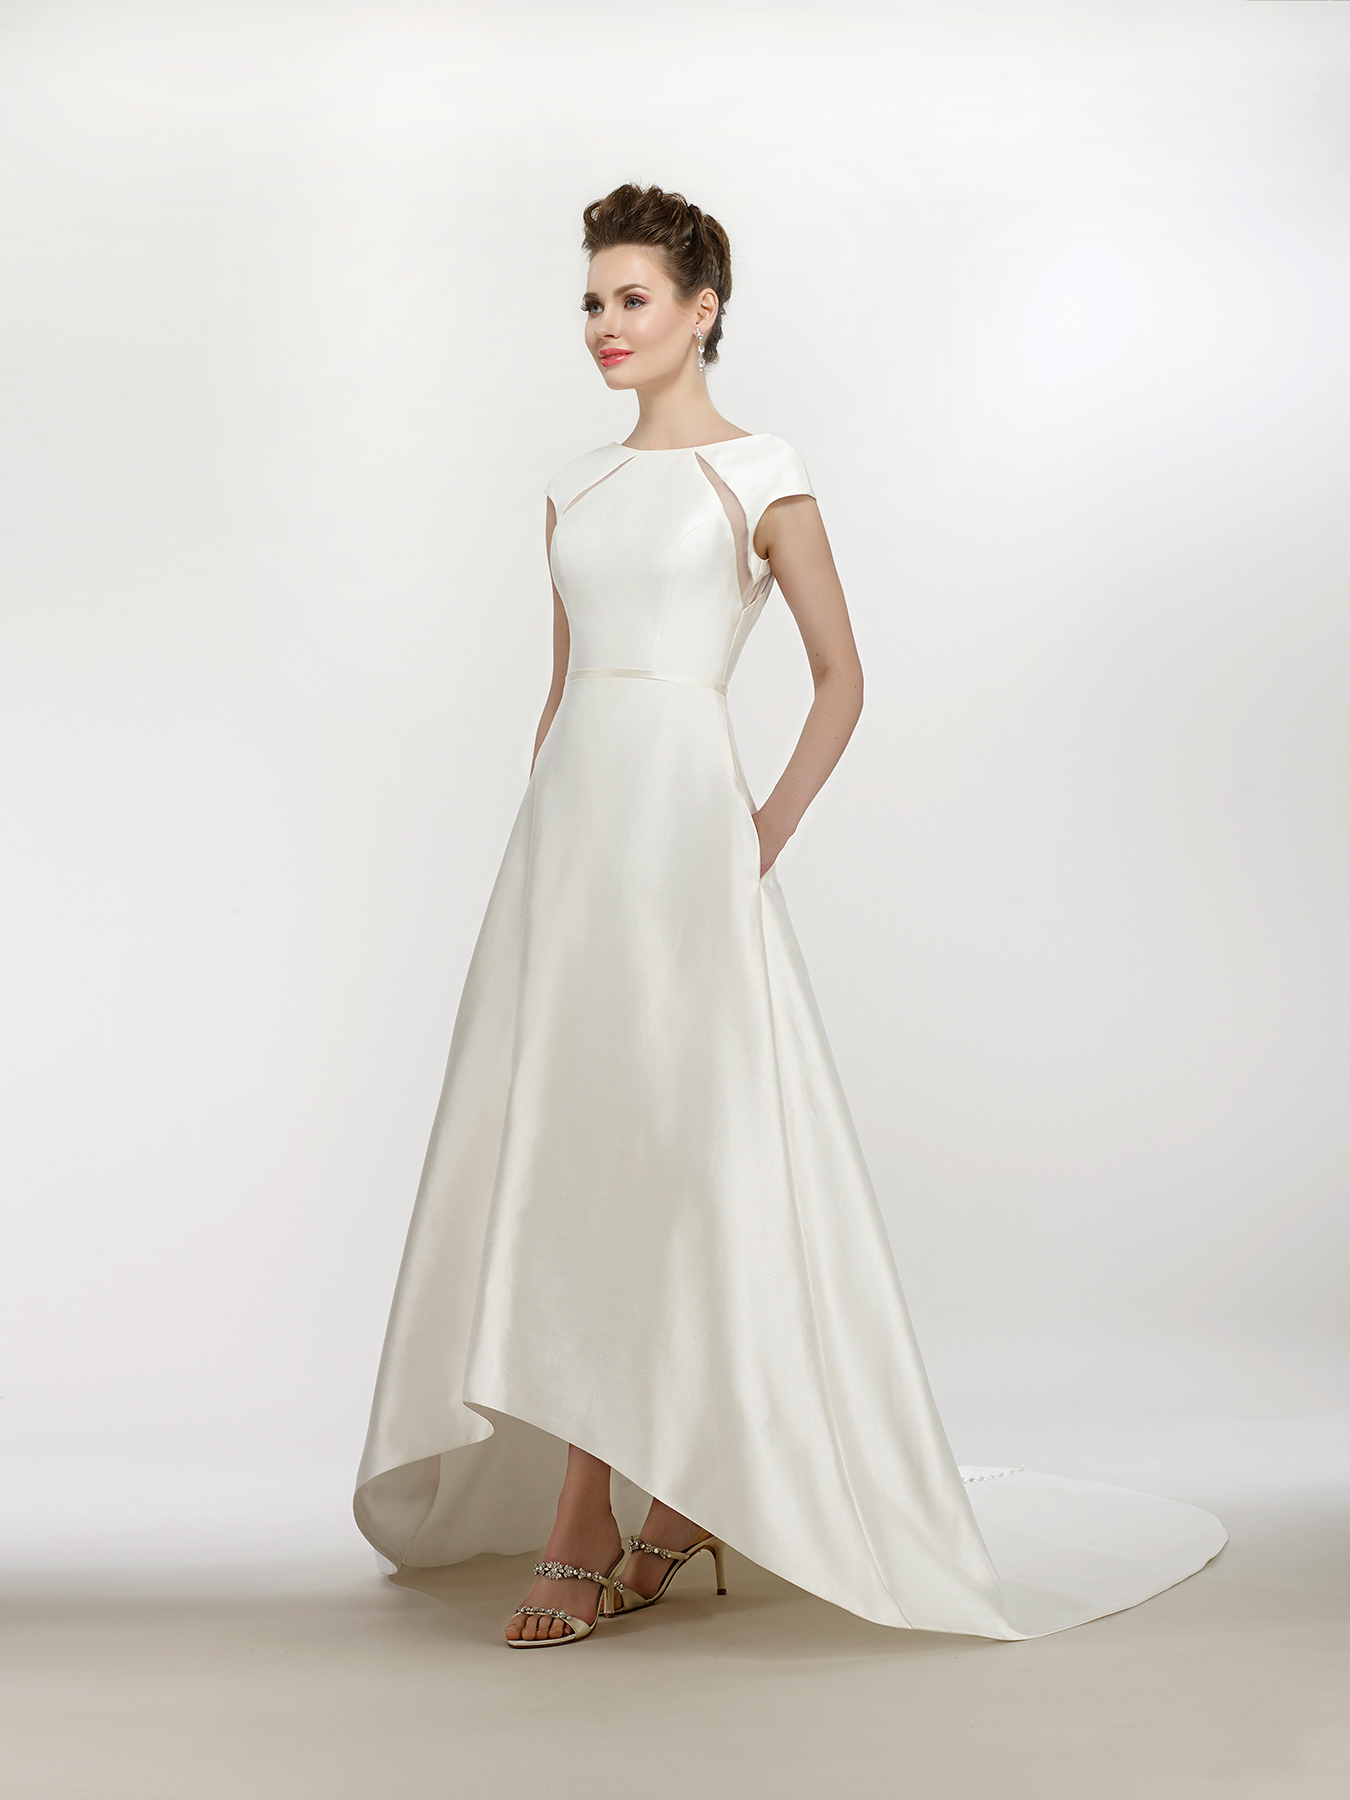 steven birnbaum wedding dress spring 2018 cap sleeves hi low